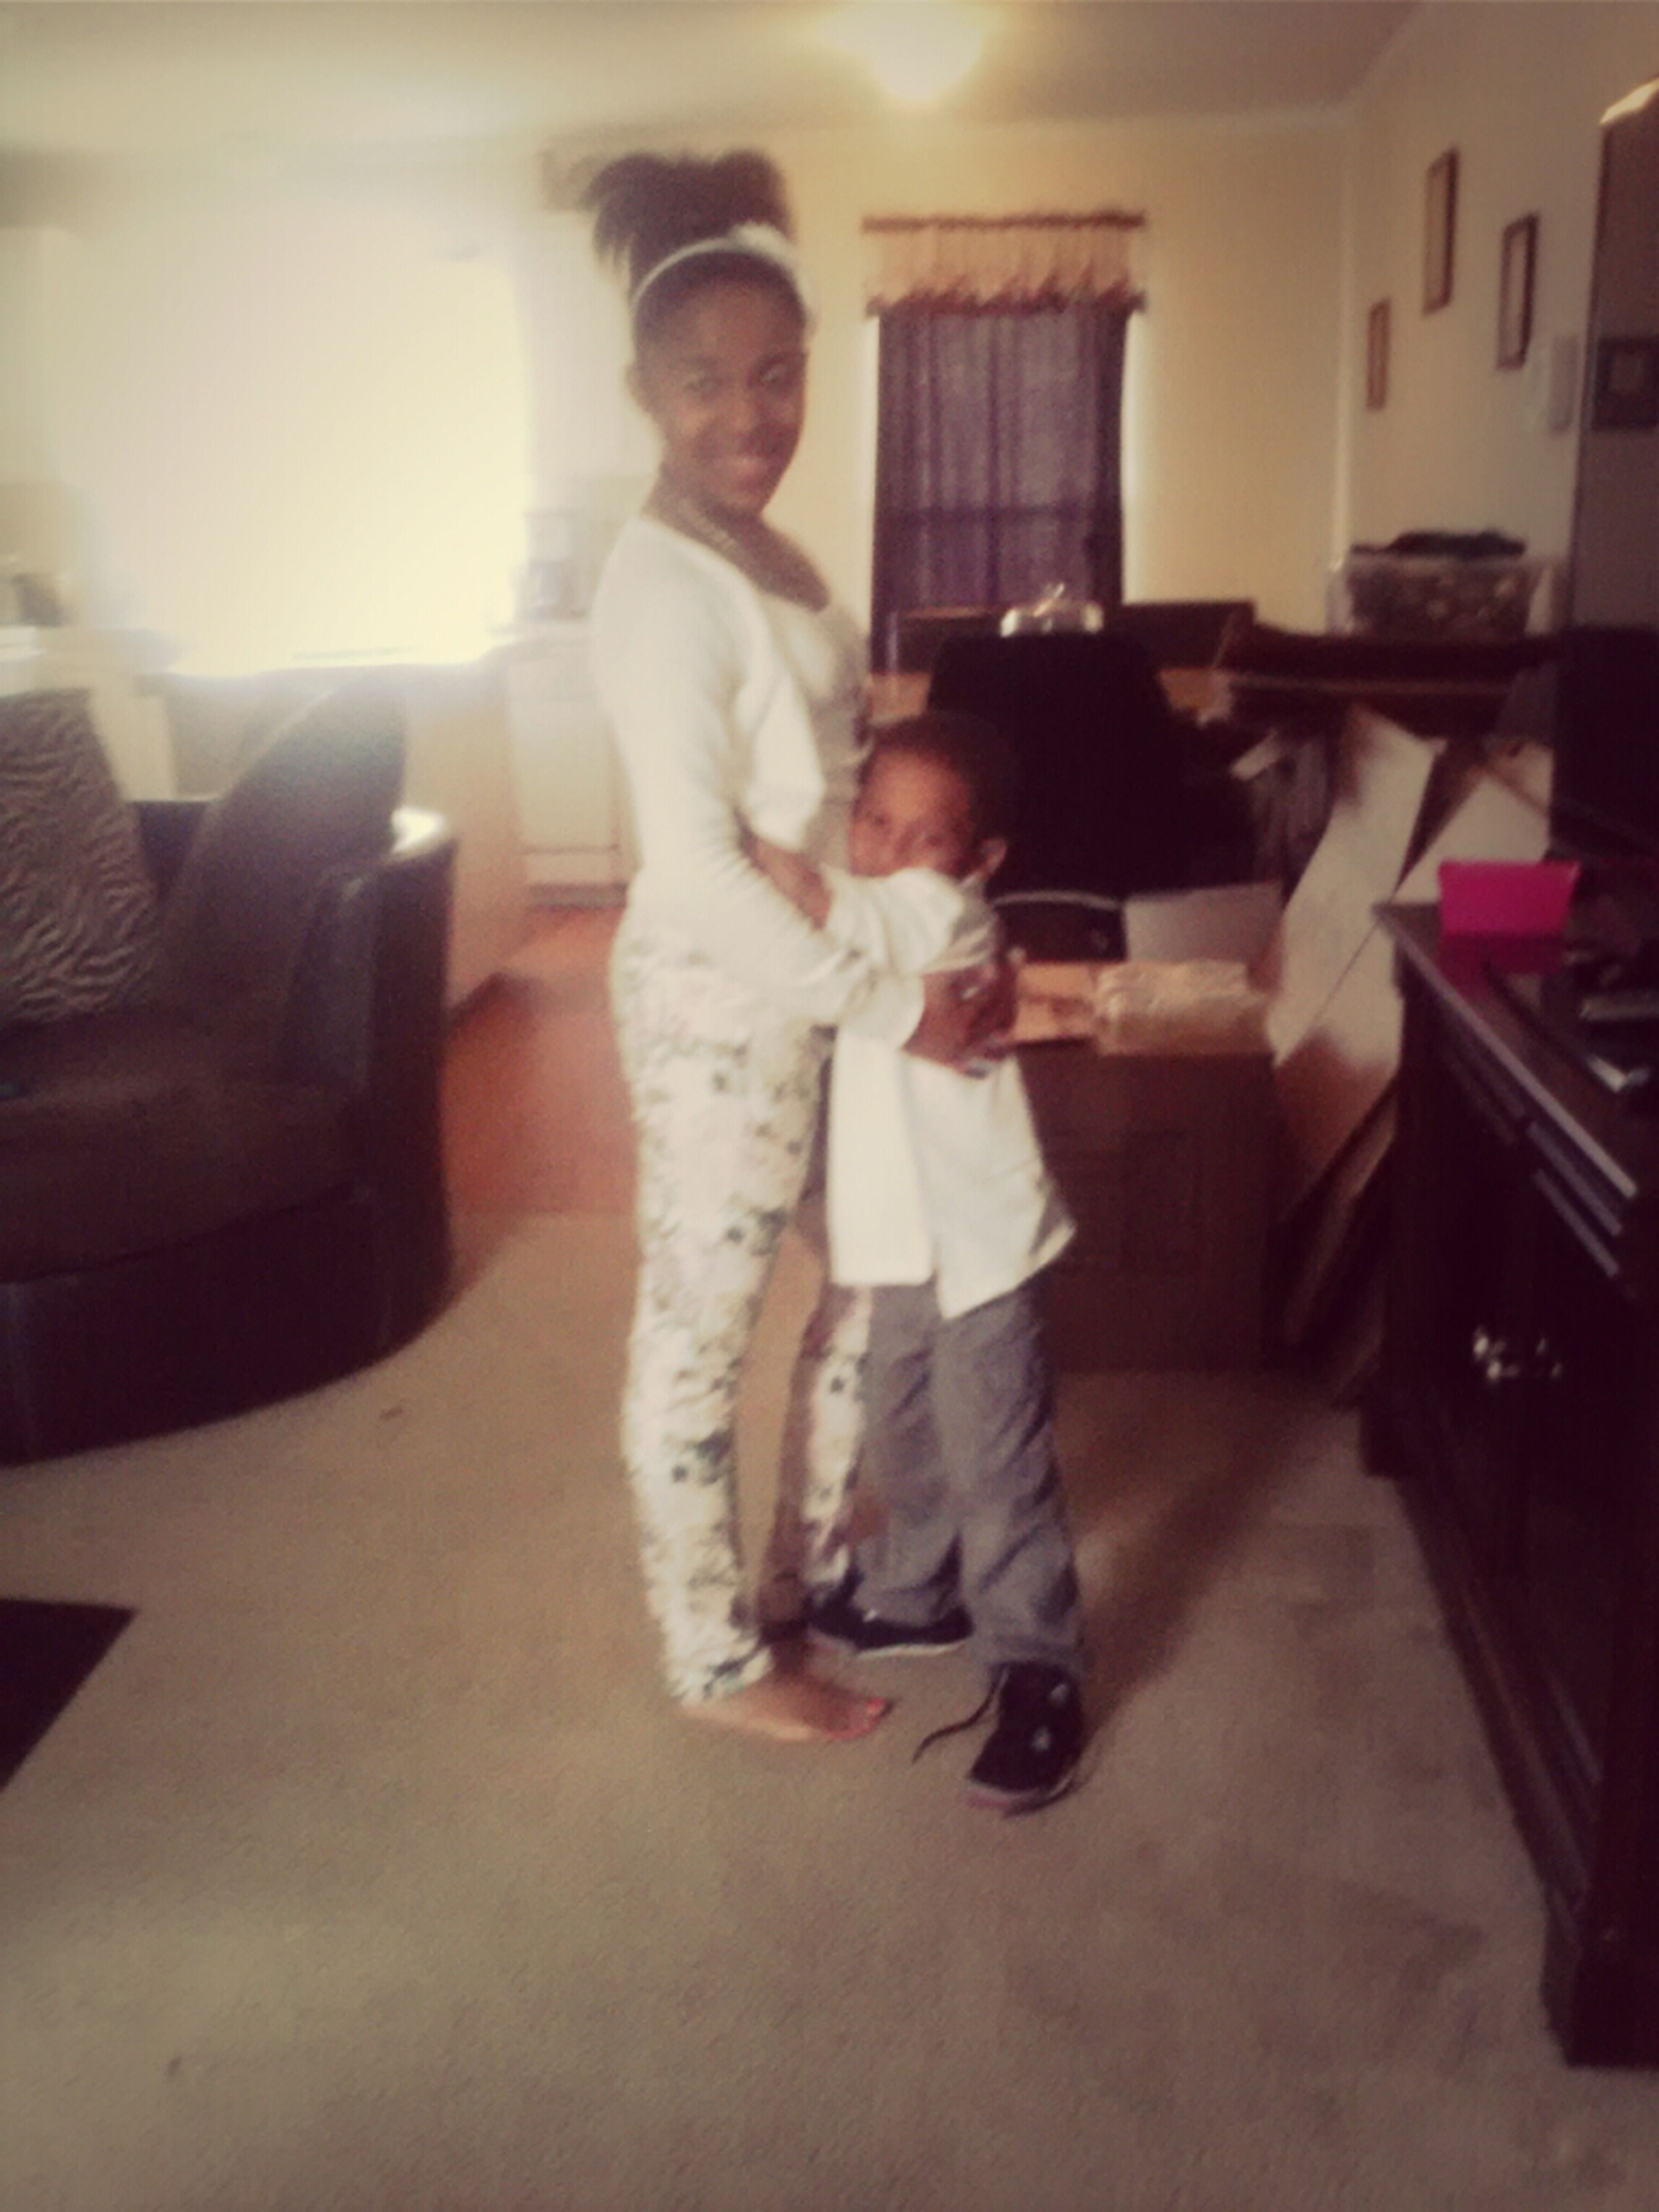 Me & My Lil Round